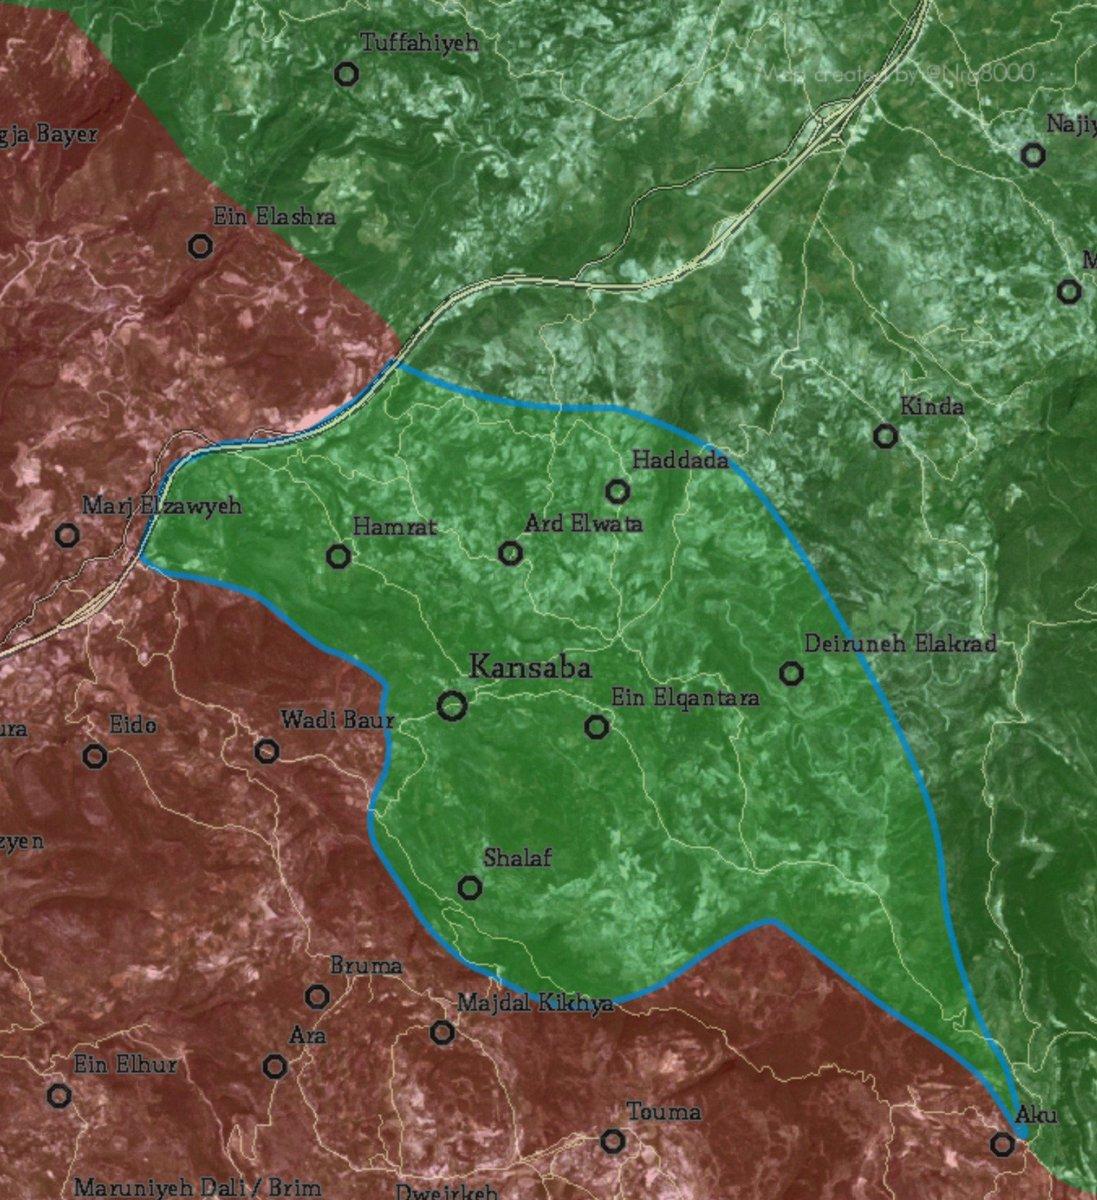 Al Nusra & Allies Capture Town of Kinsabba, Develop Advance in Latakia Province